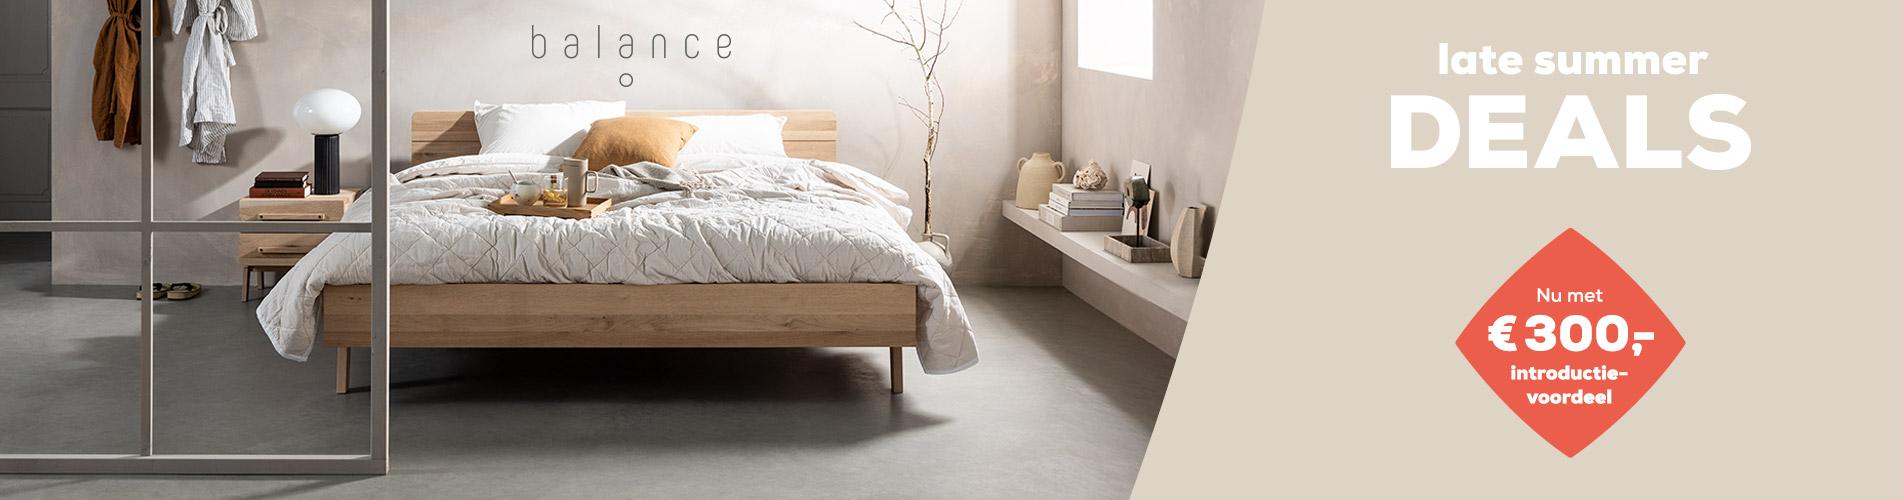 Balance Bedrames | Swiss Sense